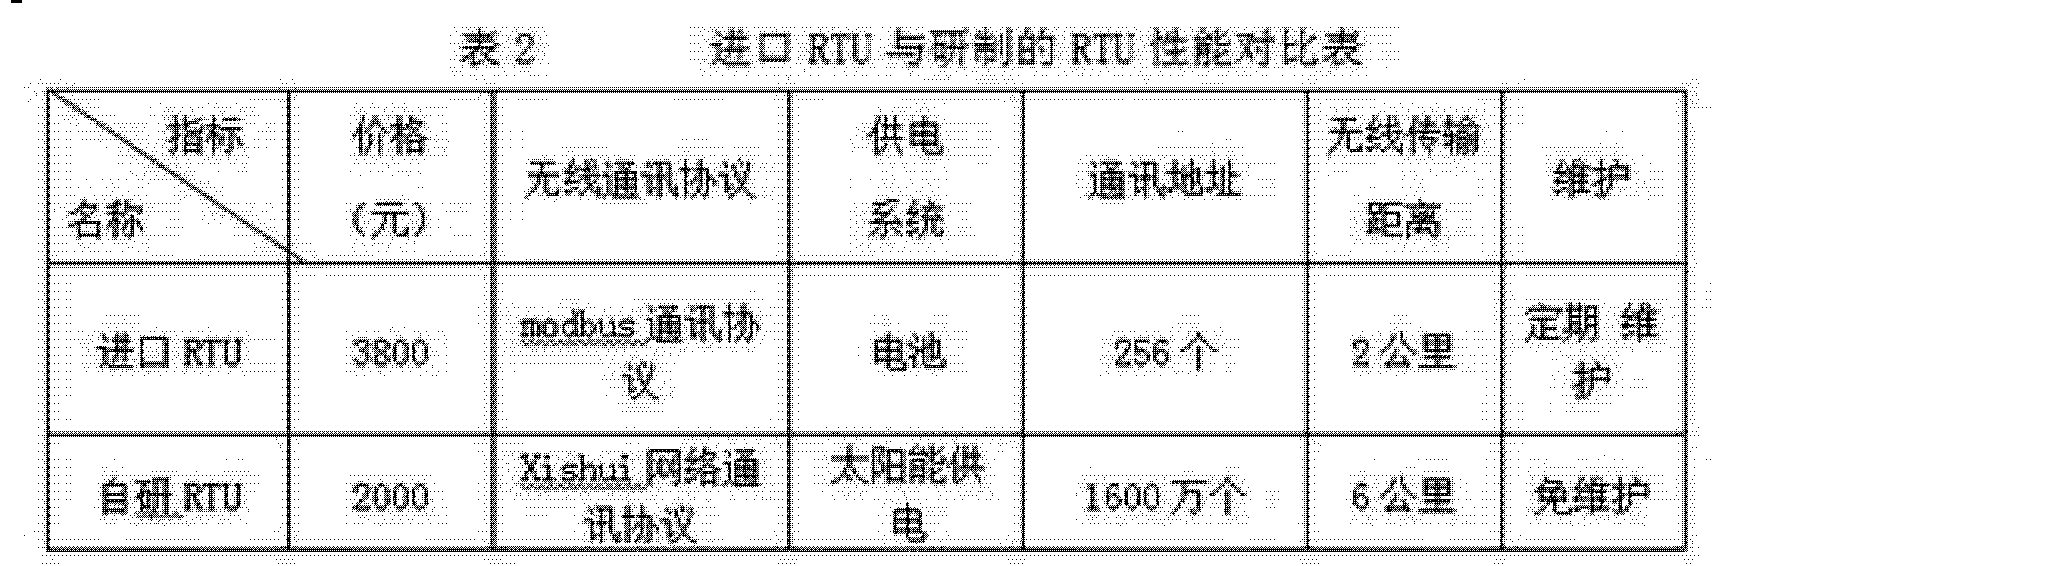 Figure CN201919444UD00092